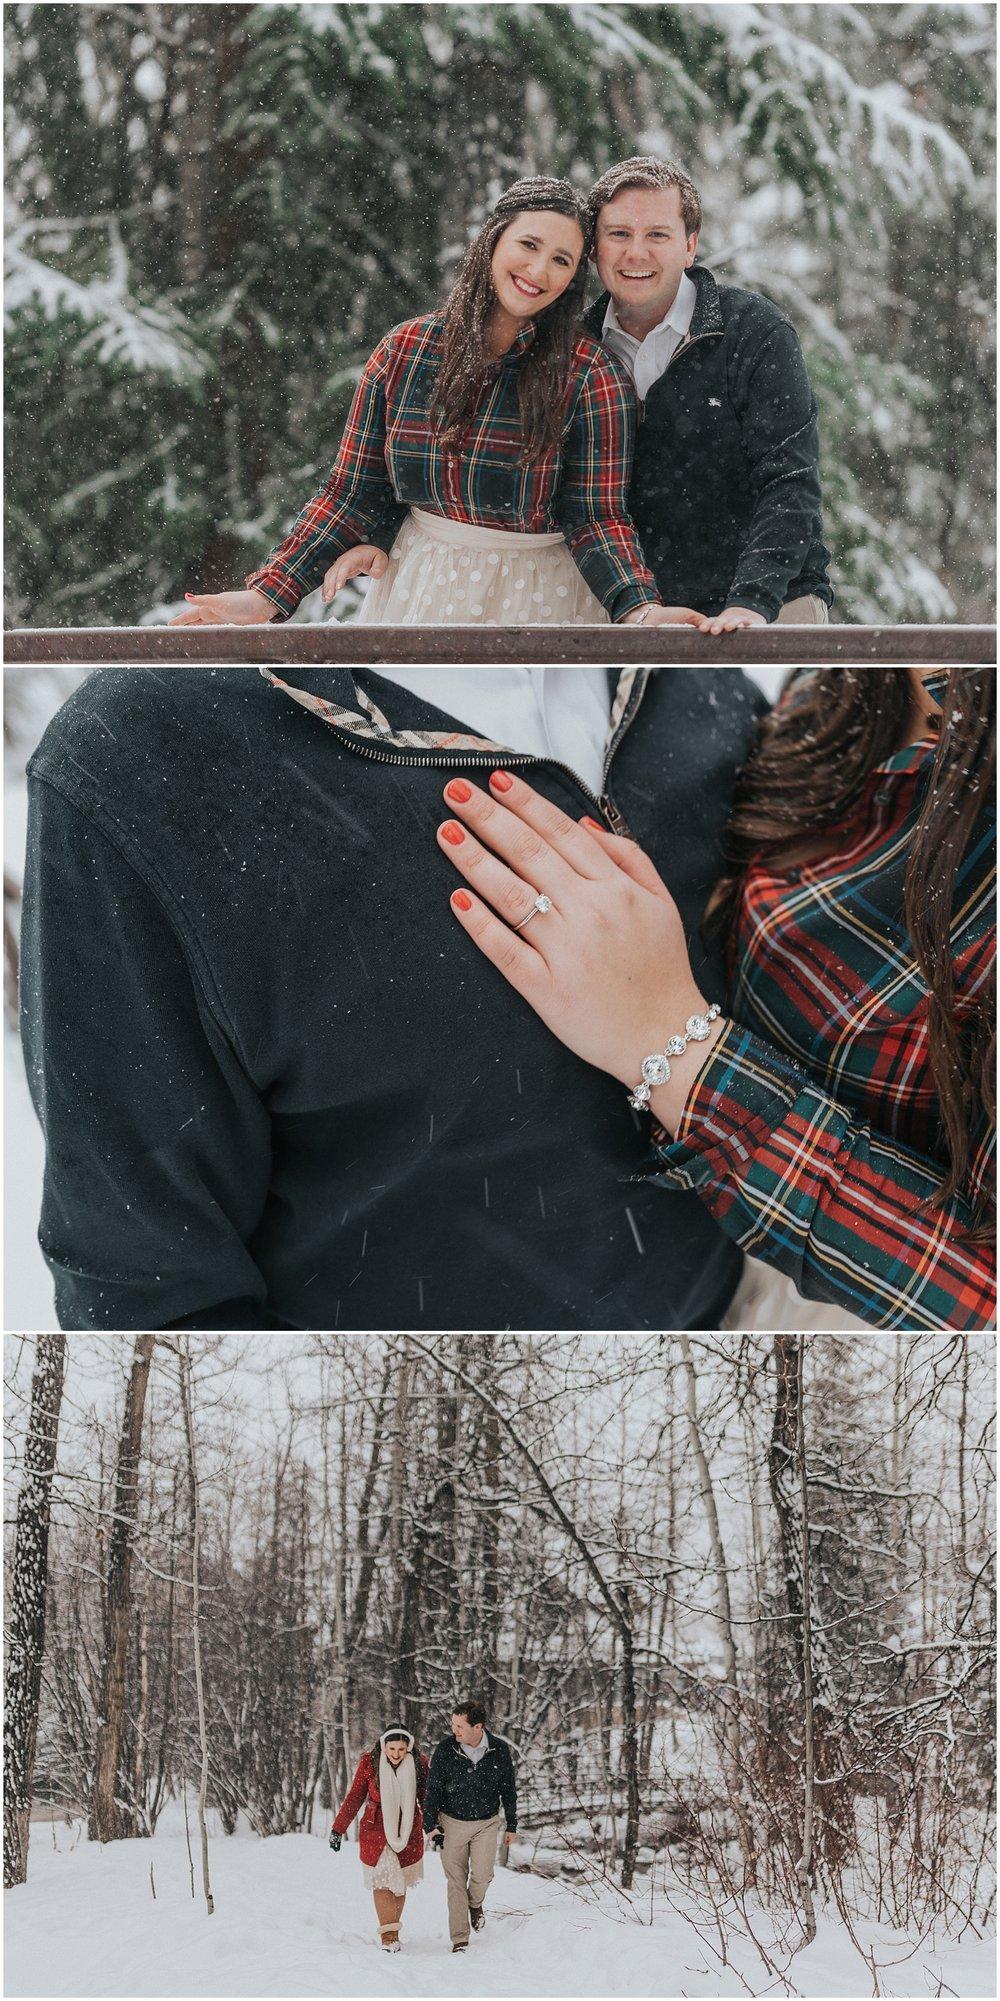 beavercreek_colorado_winter_engagement_photos_0009.jpg